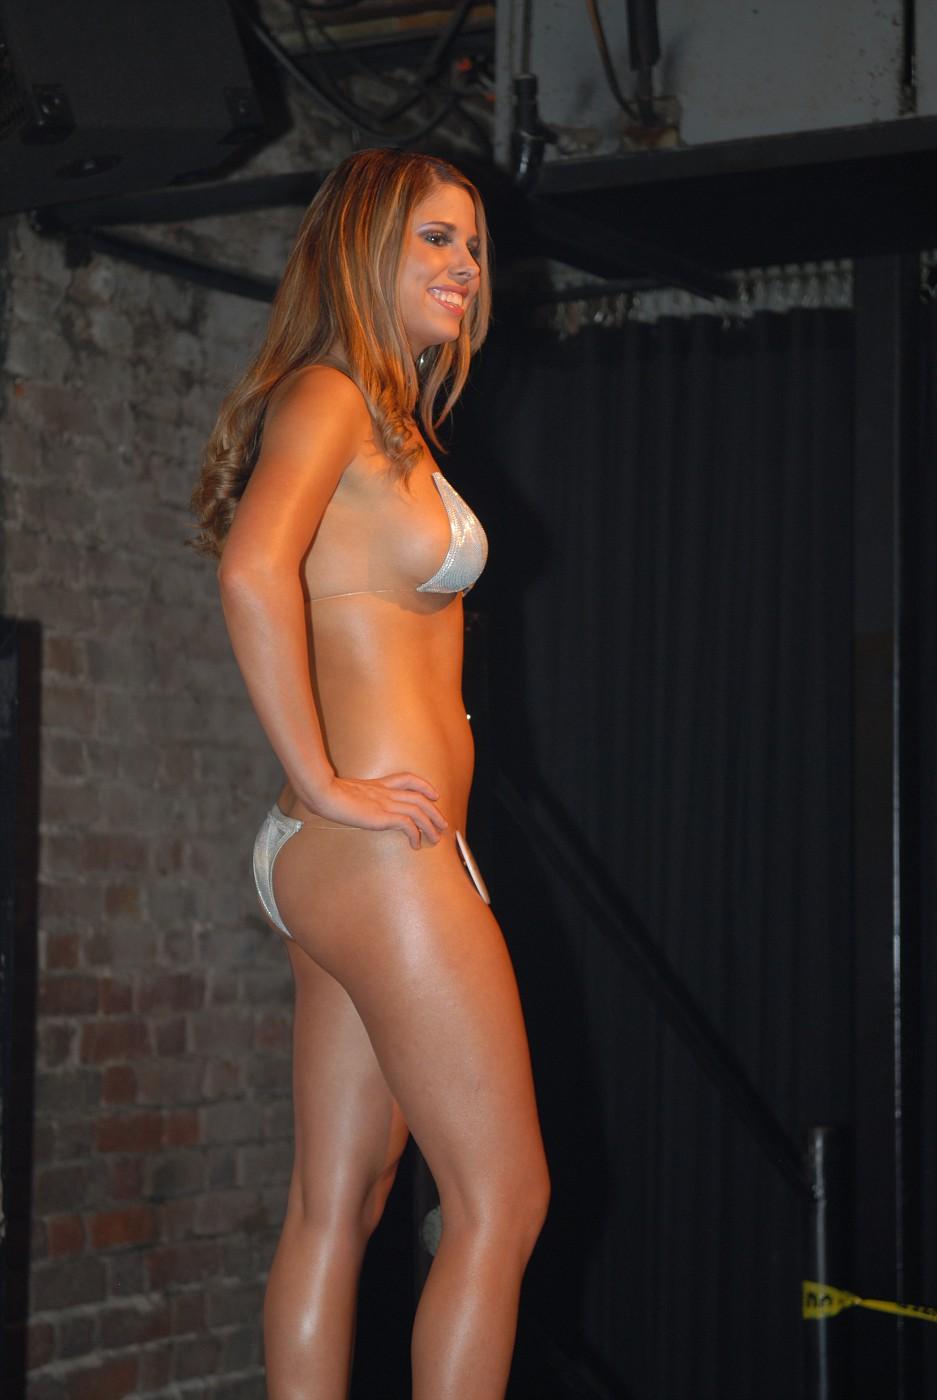 Bar bikini contest — pic 3